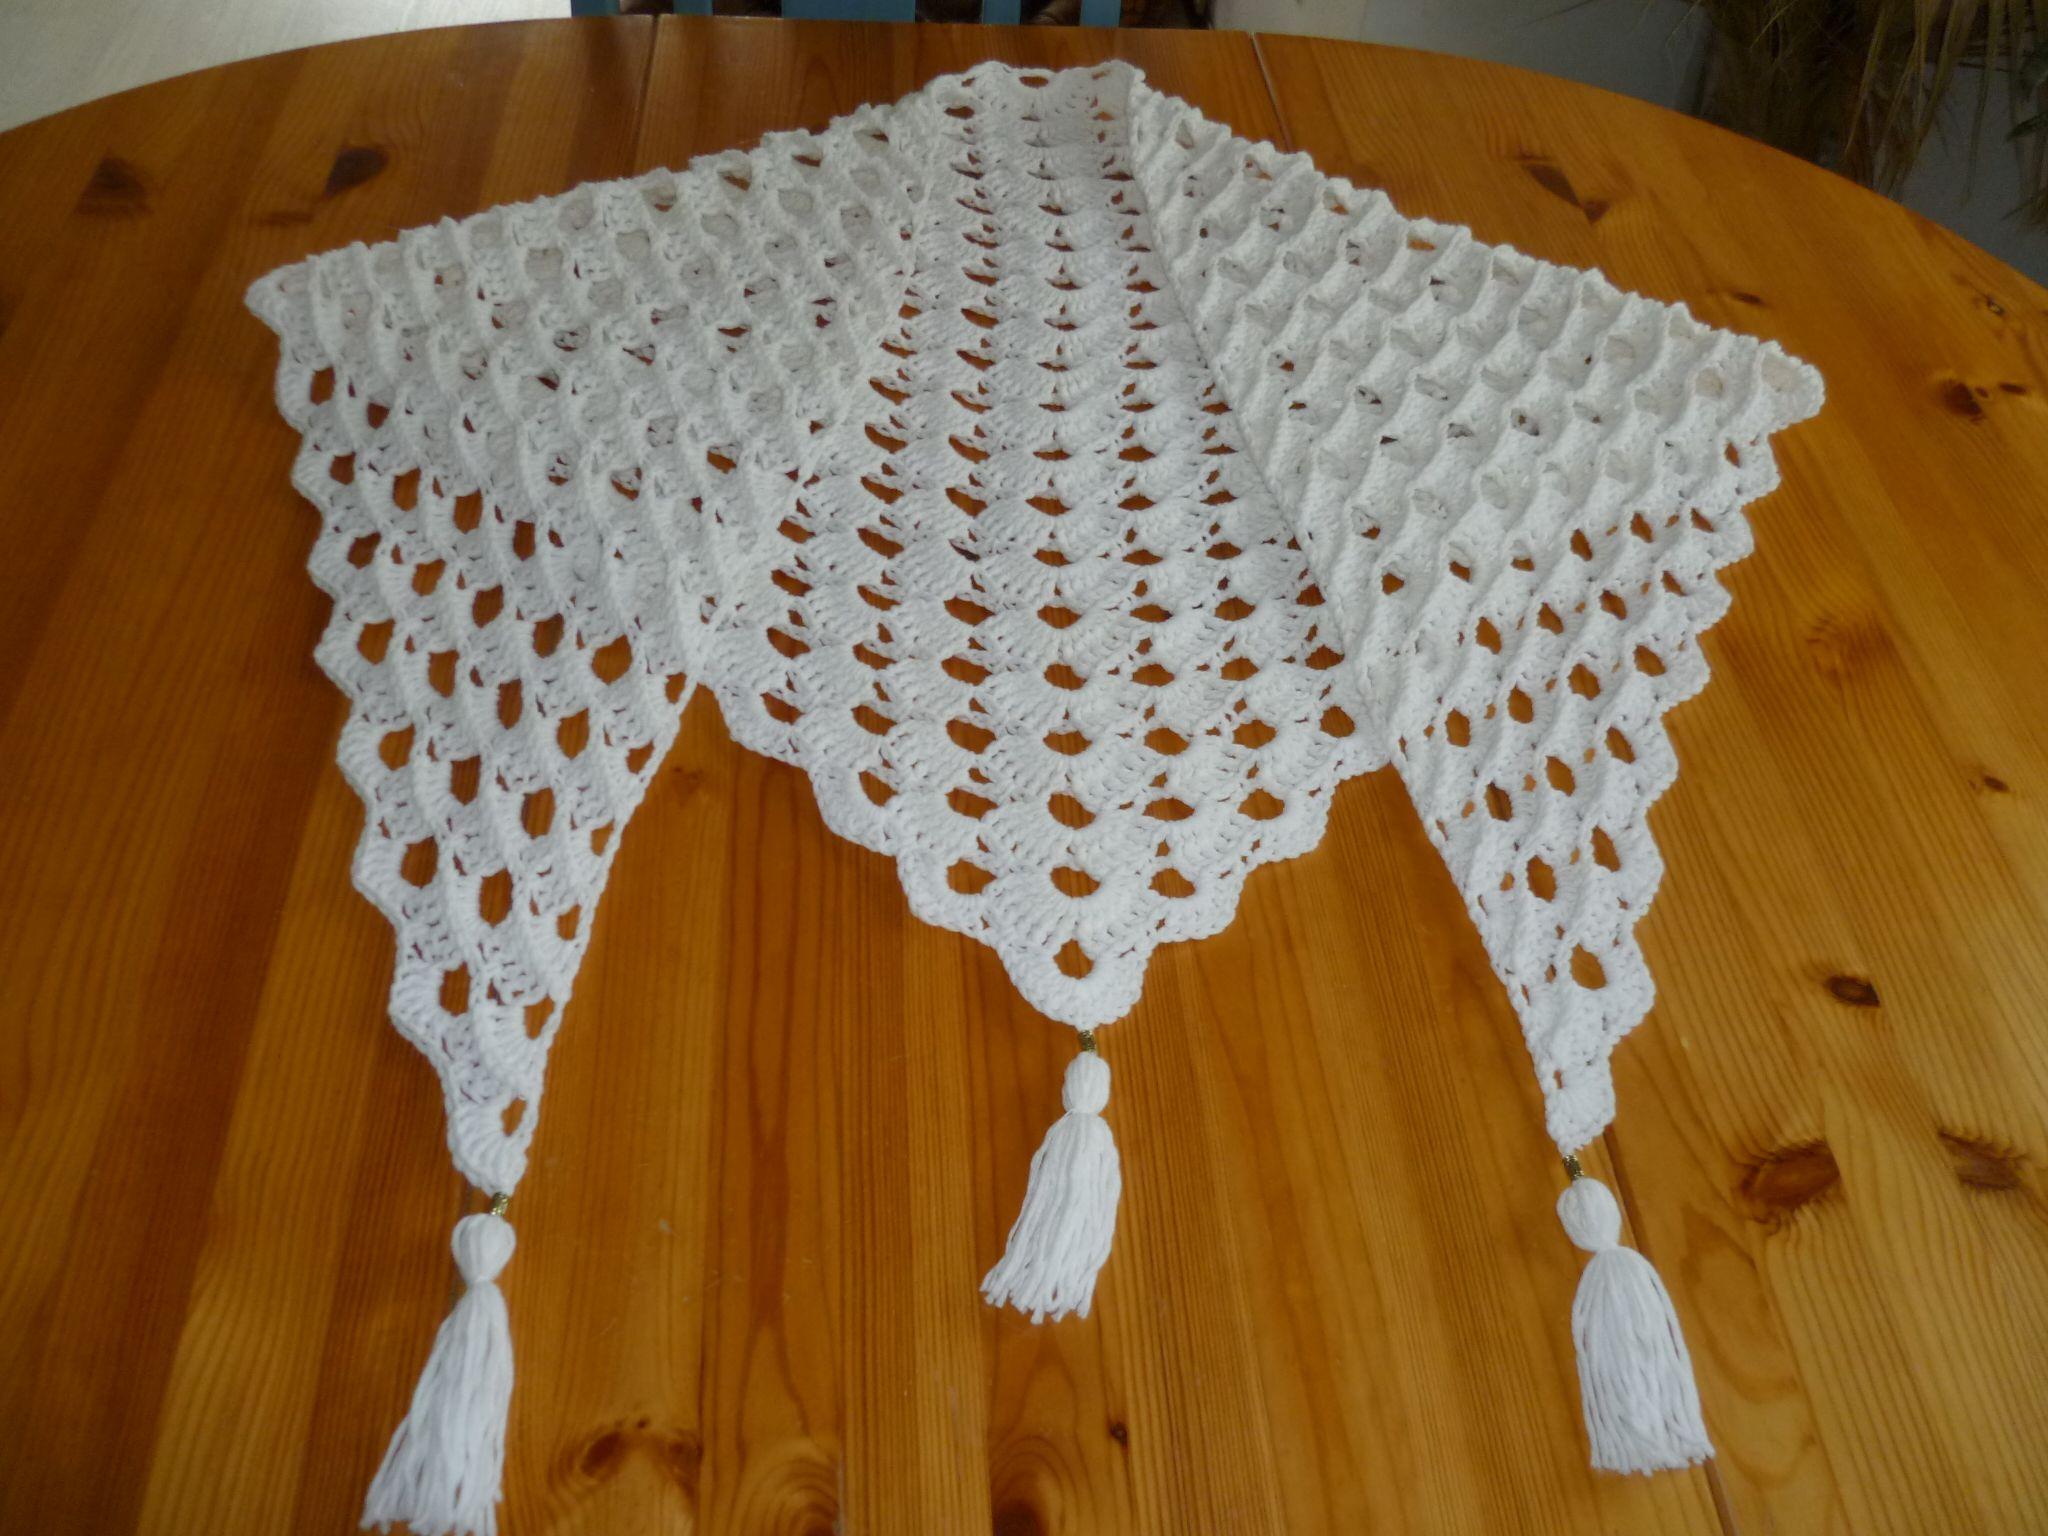 Relief-Muschel-Tuch für Gabi fertig :-) | Tücher, Handwärmer, Mützen ...